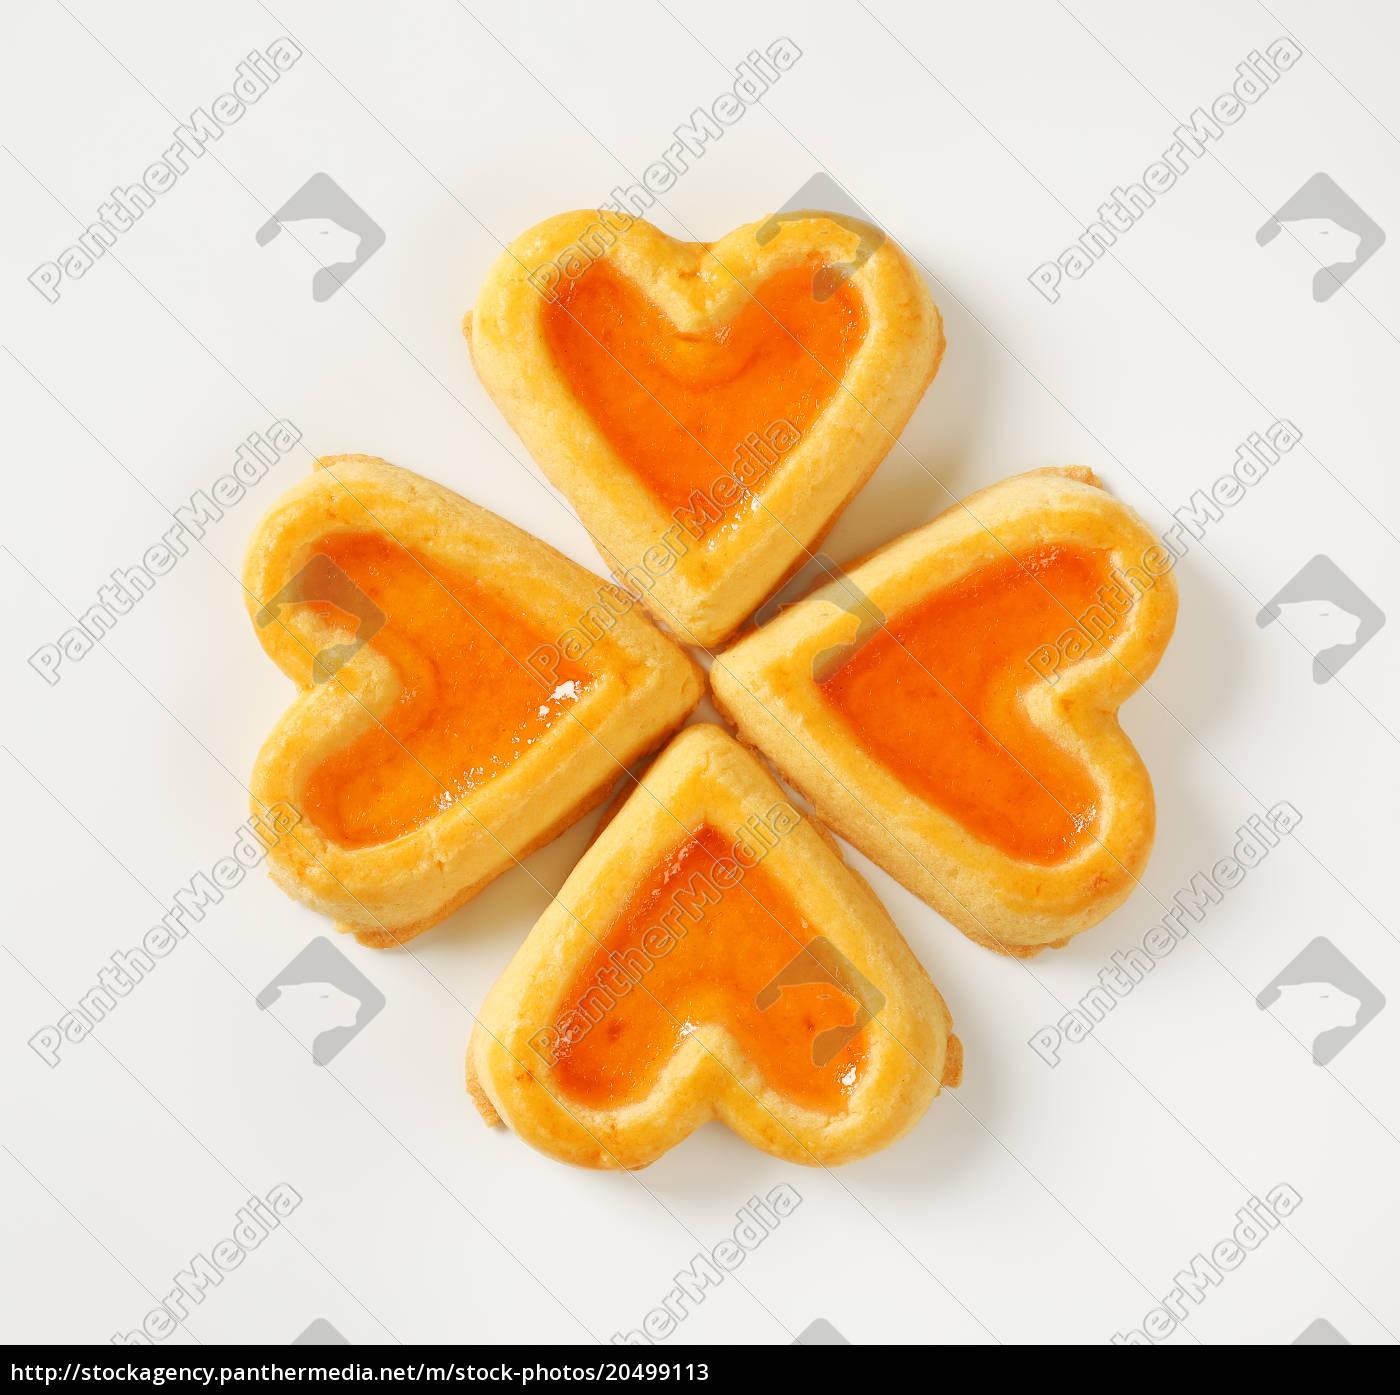 herzförmige, kekse, mit, marmelade - 20499113